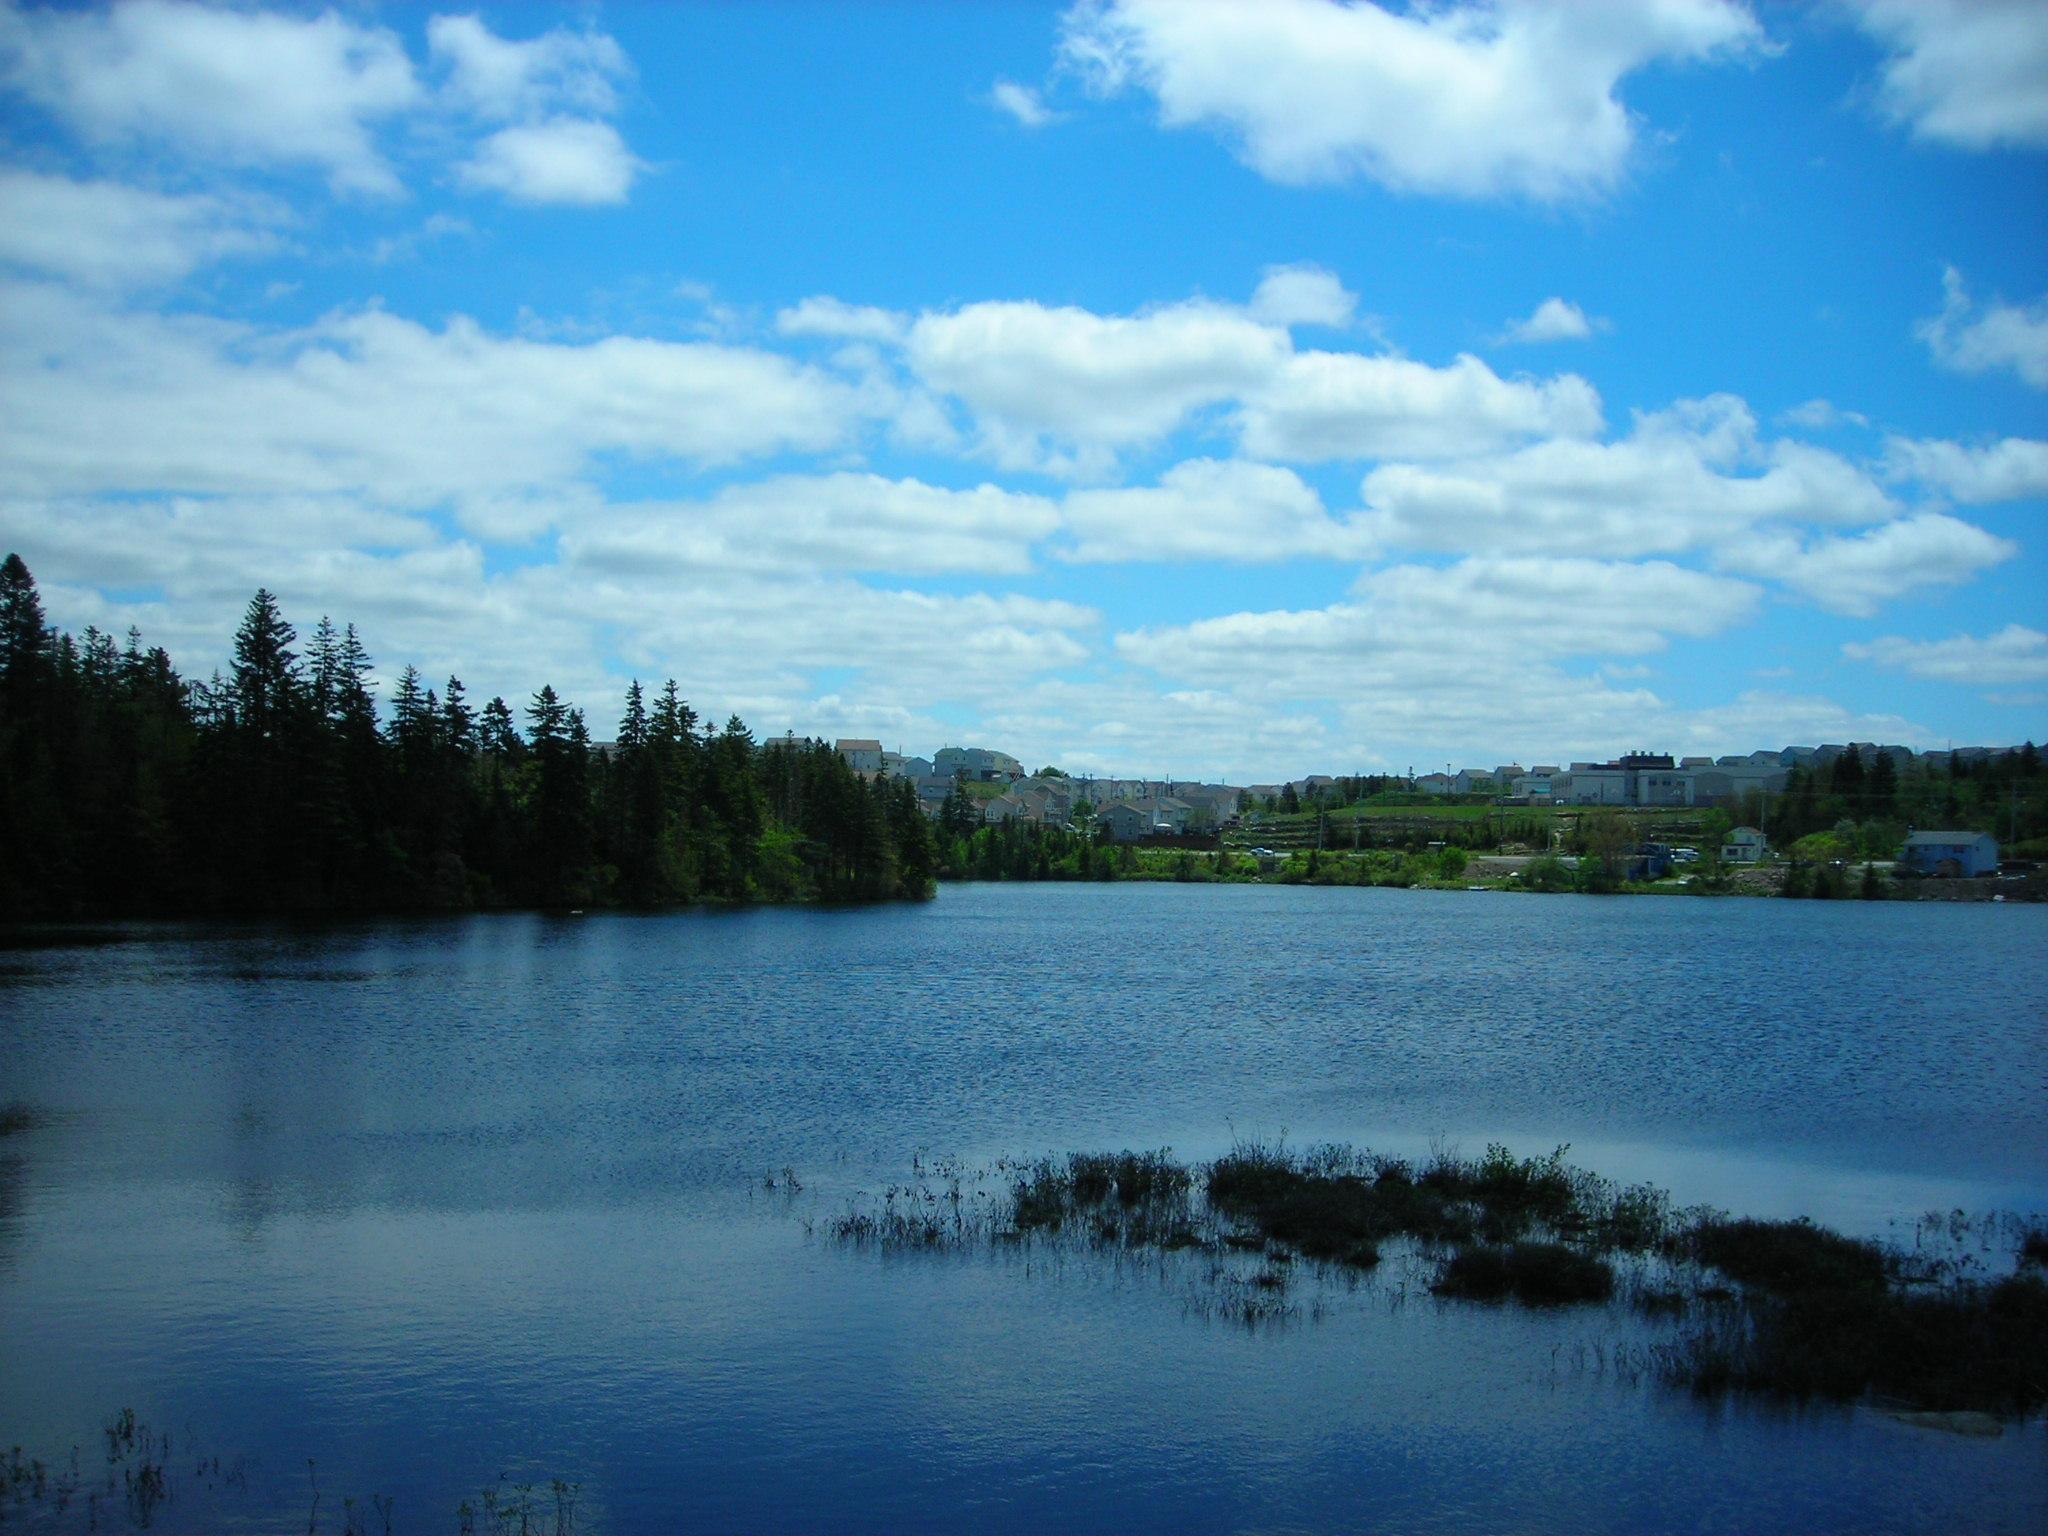 Lovett_Lake_Nova_Scotia_Canada_May_2010